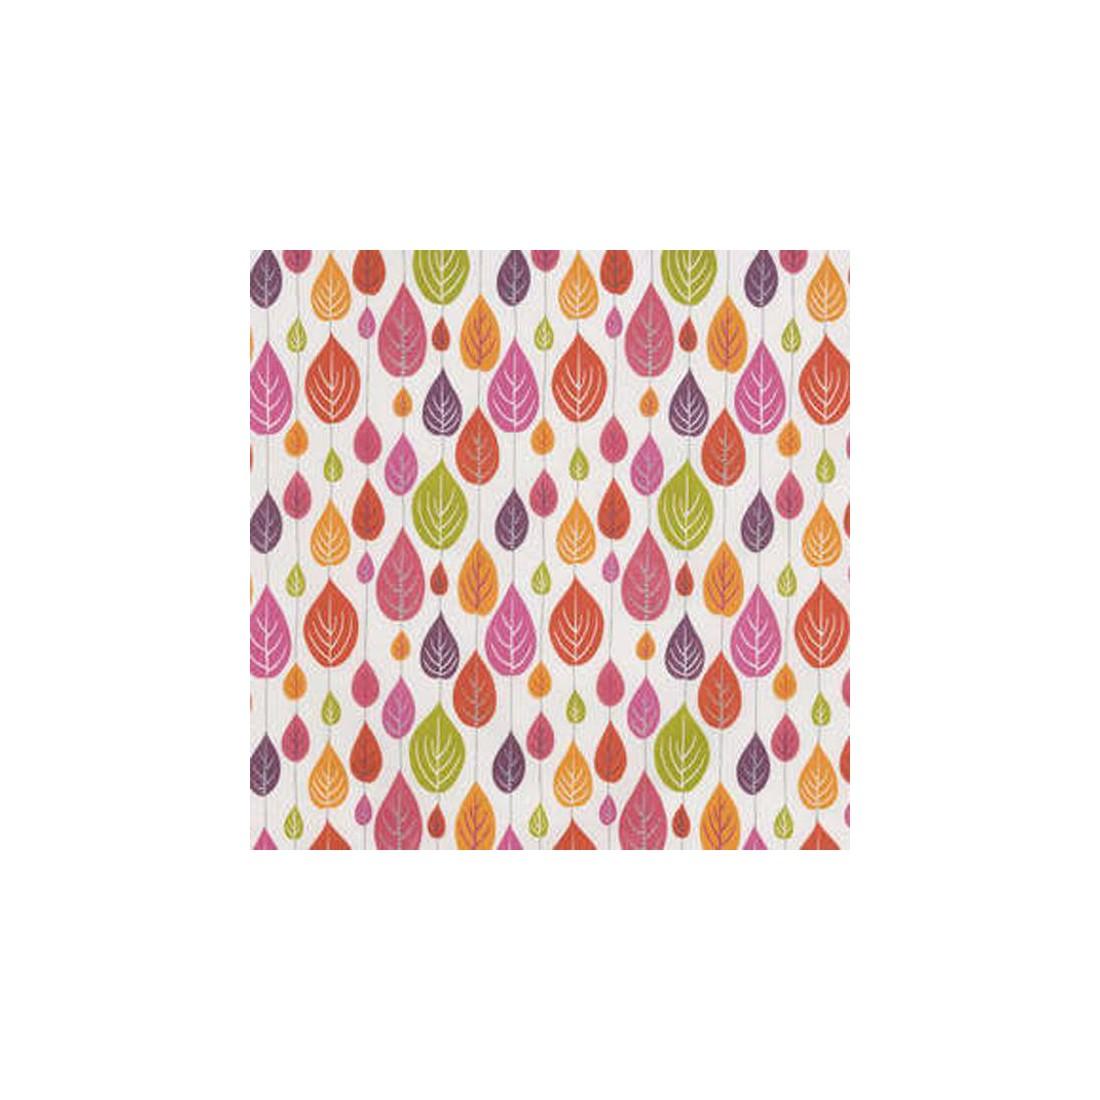 Tissu d'ameublement Farandole de Boussac coloris Gourmandise O7756002